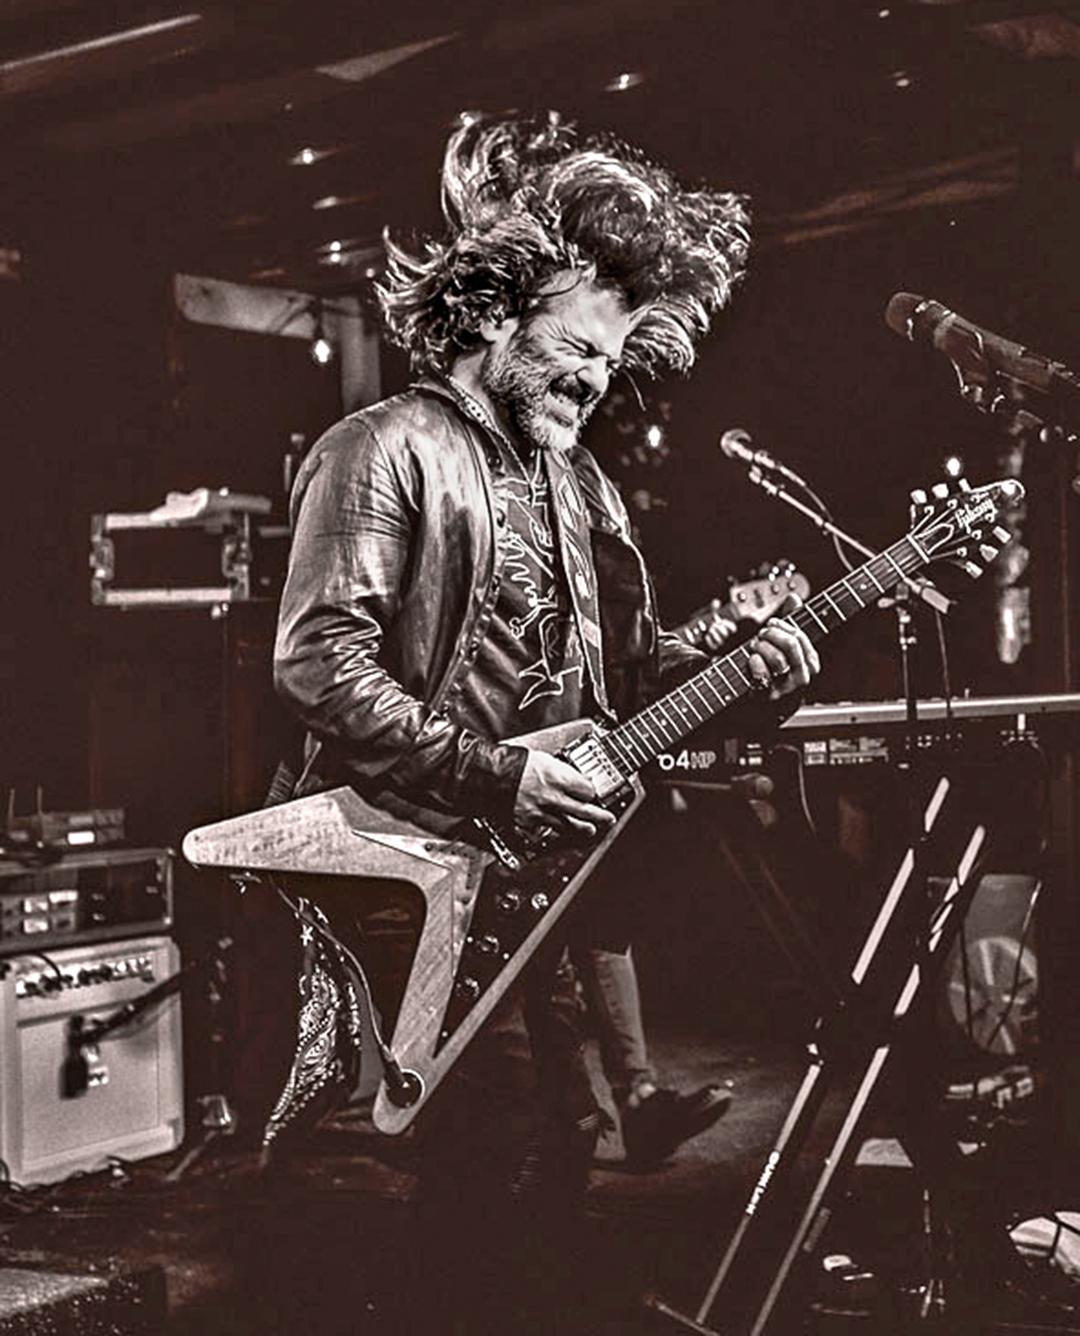 john on guitar SXSW stage